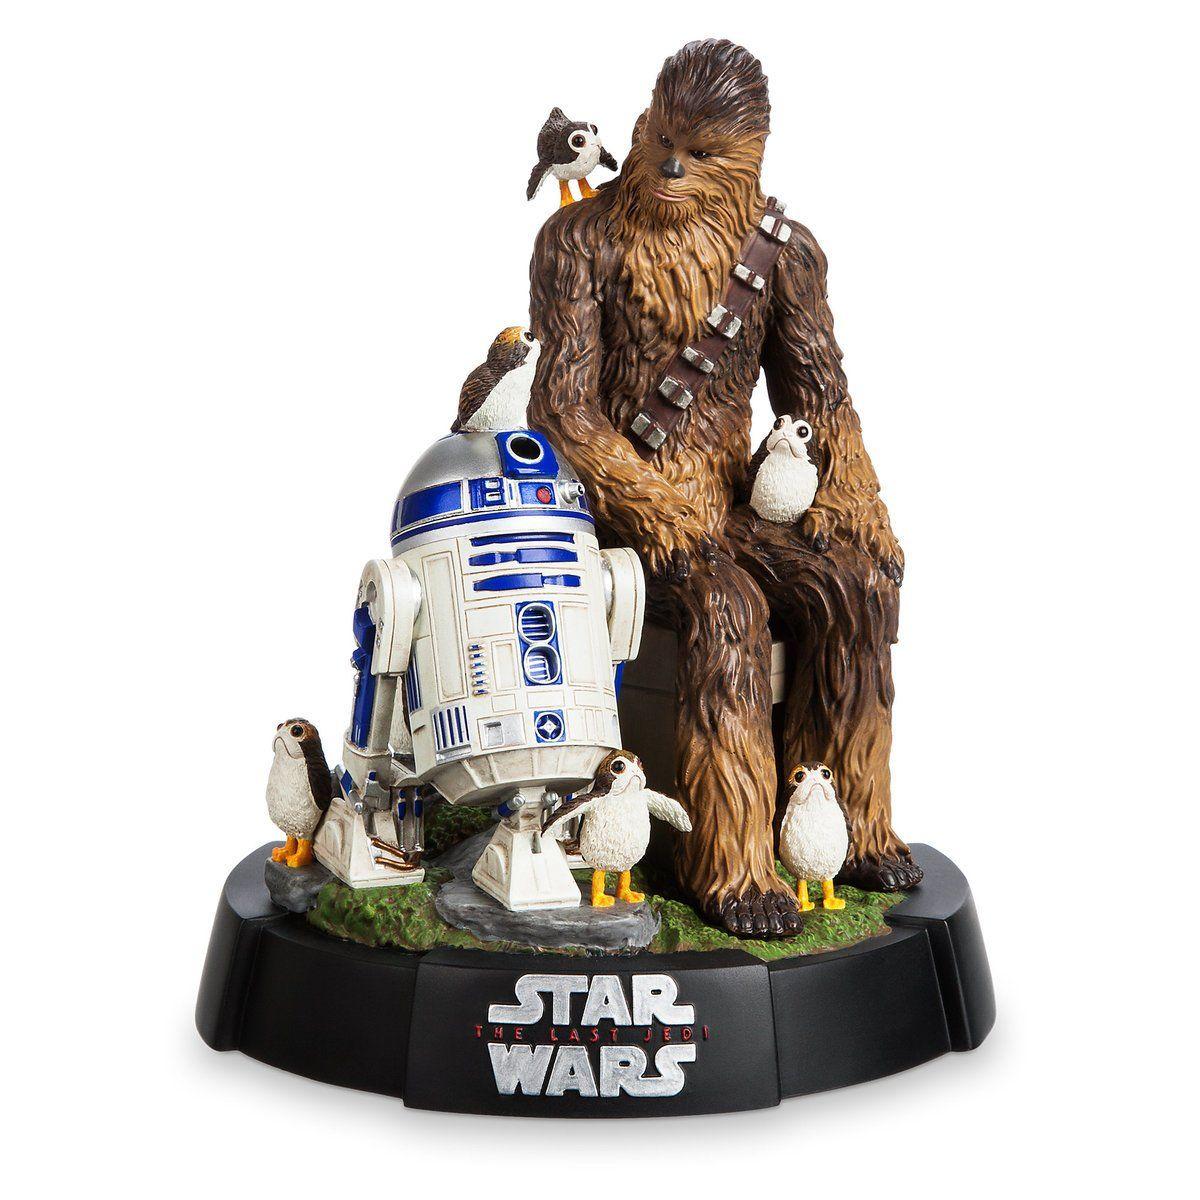 Estátua Chewbacca, R2-D2 & Porgs: Star Wars Os Últimos Jedi (The Last Jedi) - Disney